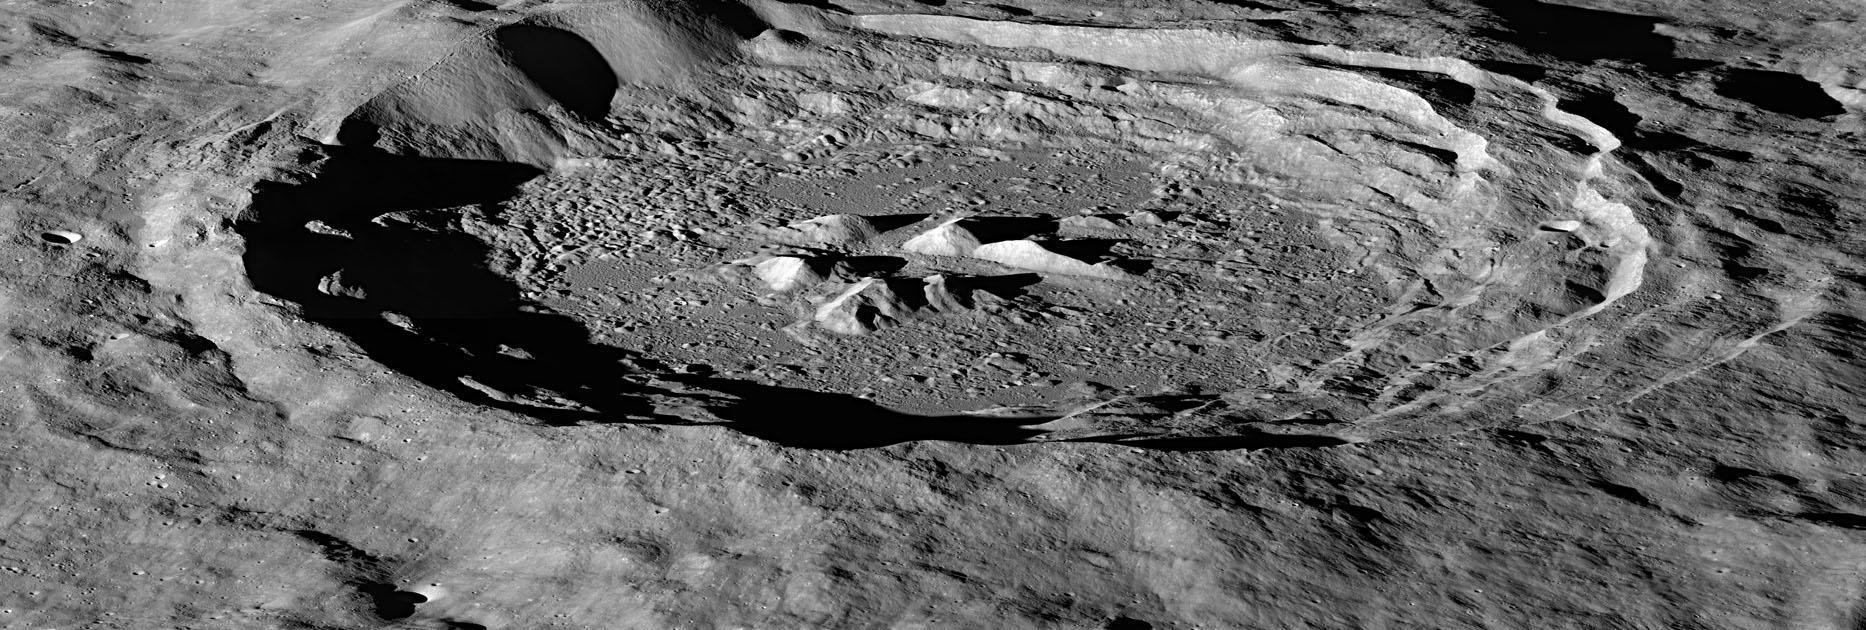 hayn-crater-moon.jpg